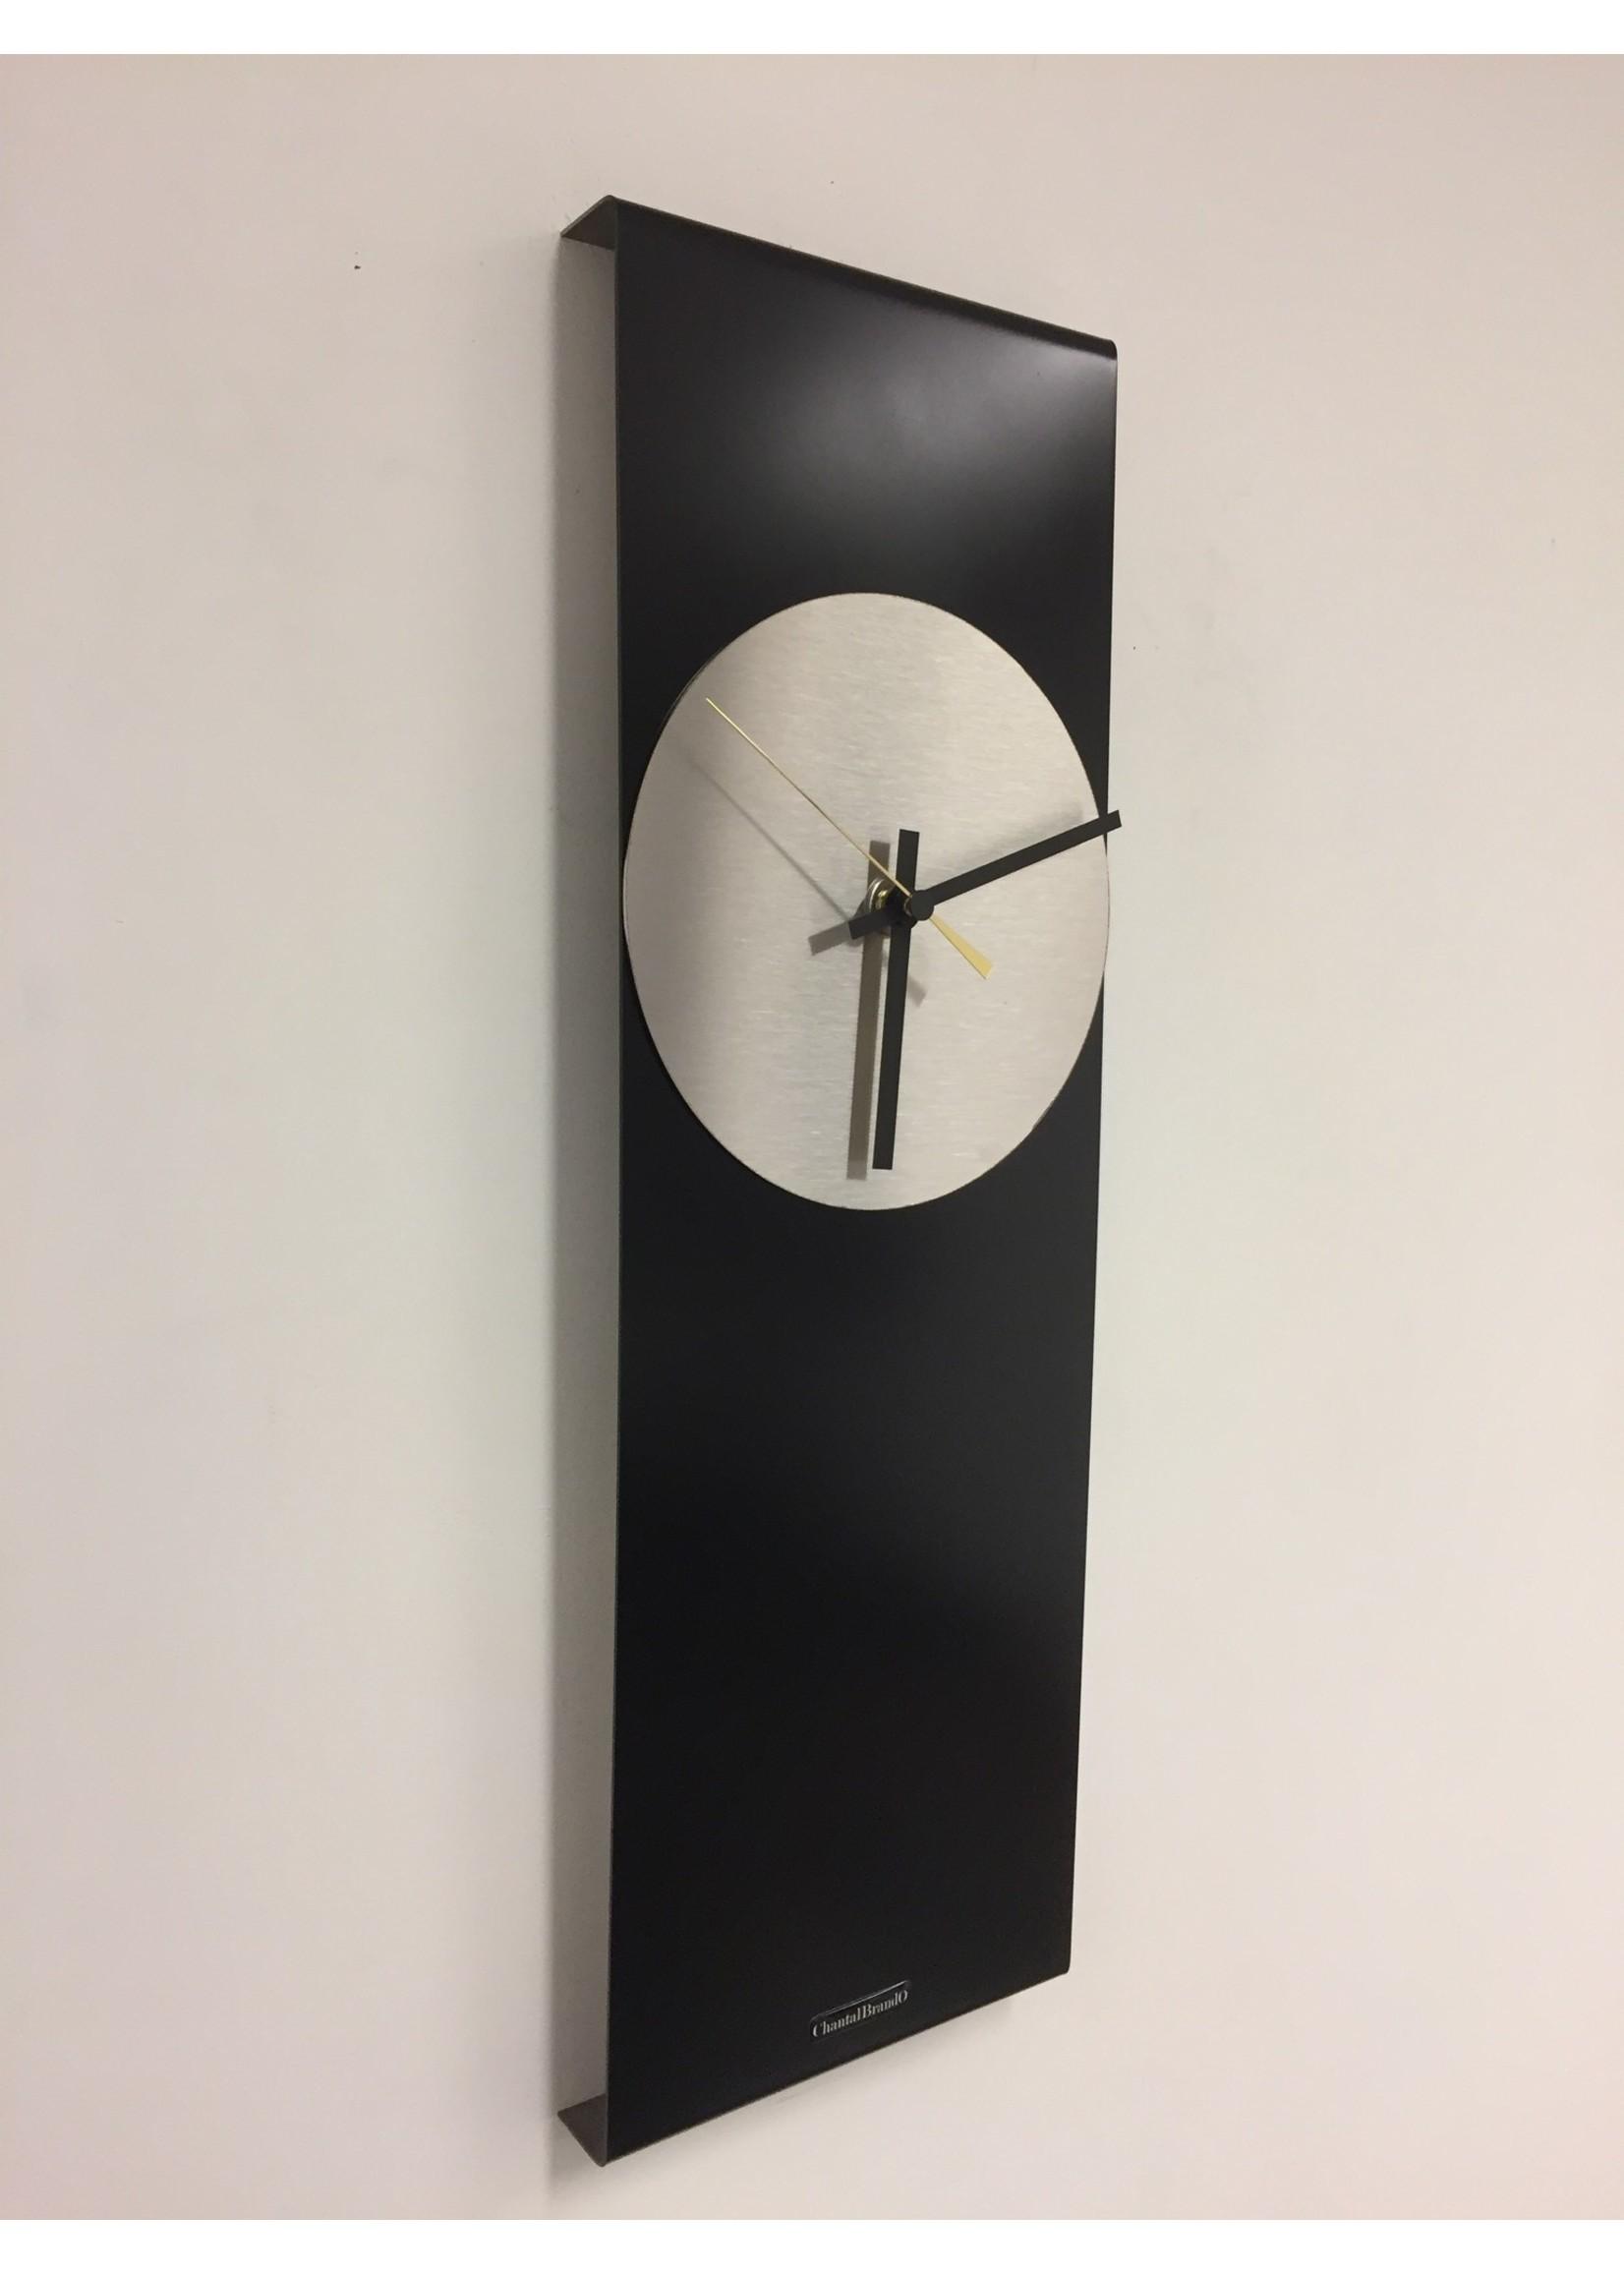 Klokkendiscounter Wandklok LaBrand Export Design Black & Gold Pointer